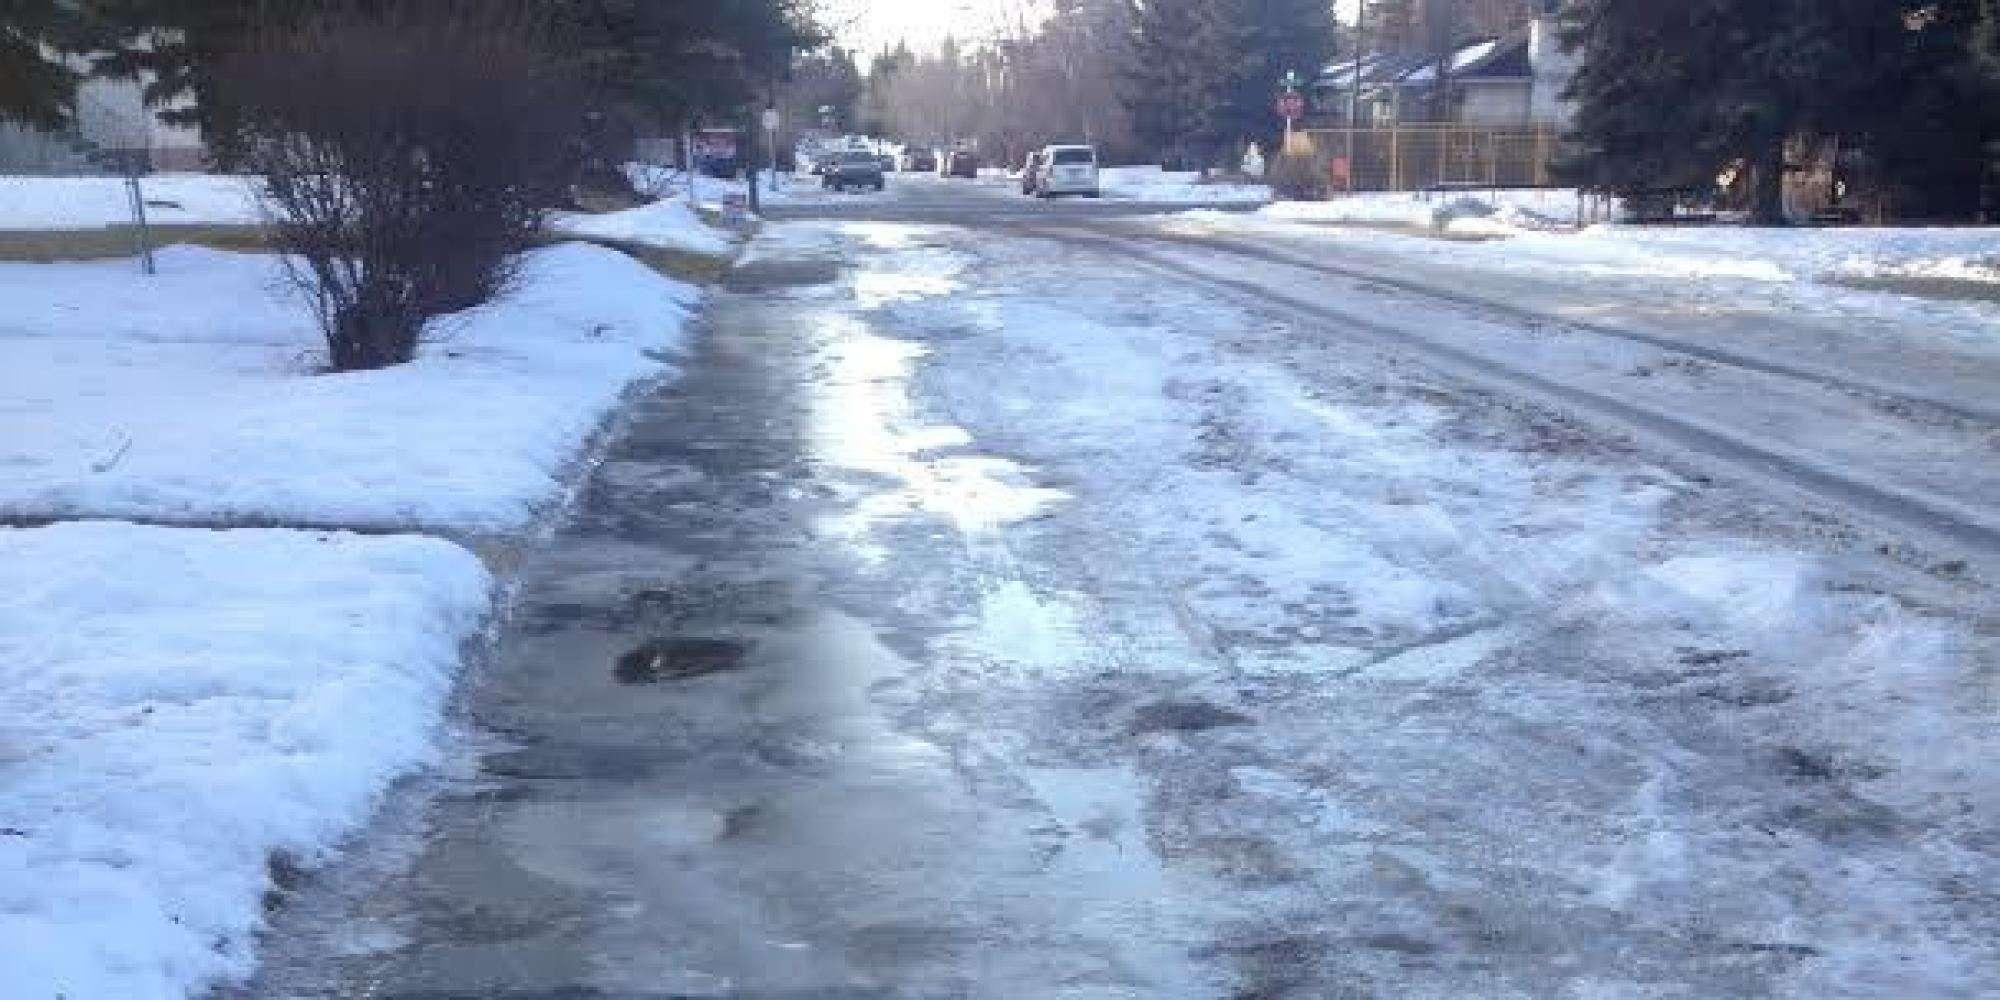 lawyer slip on ice